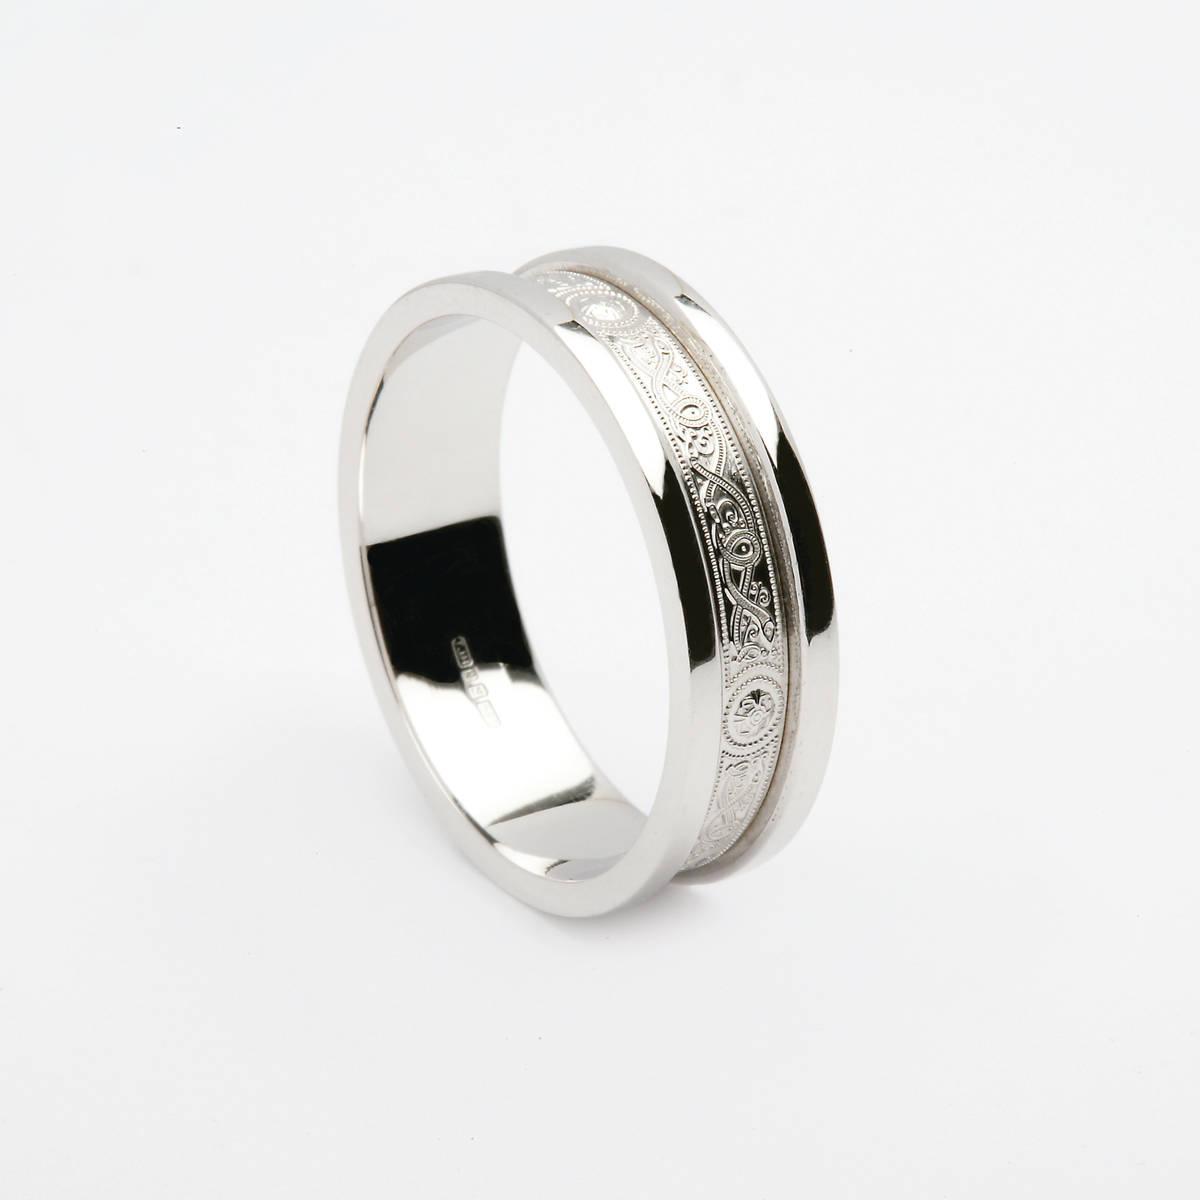 Platinum Arda unisex wedding ring